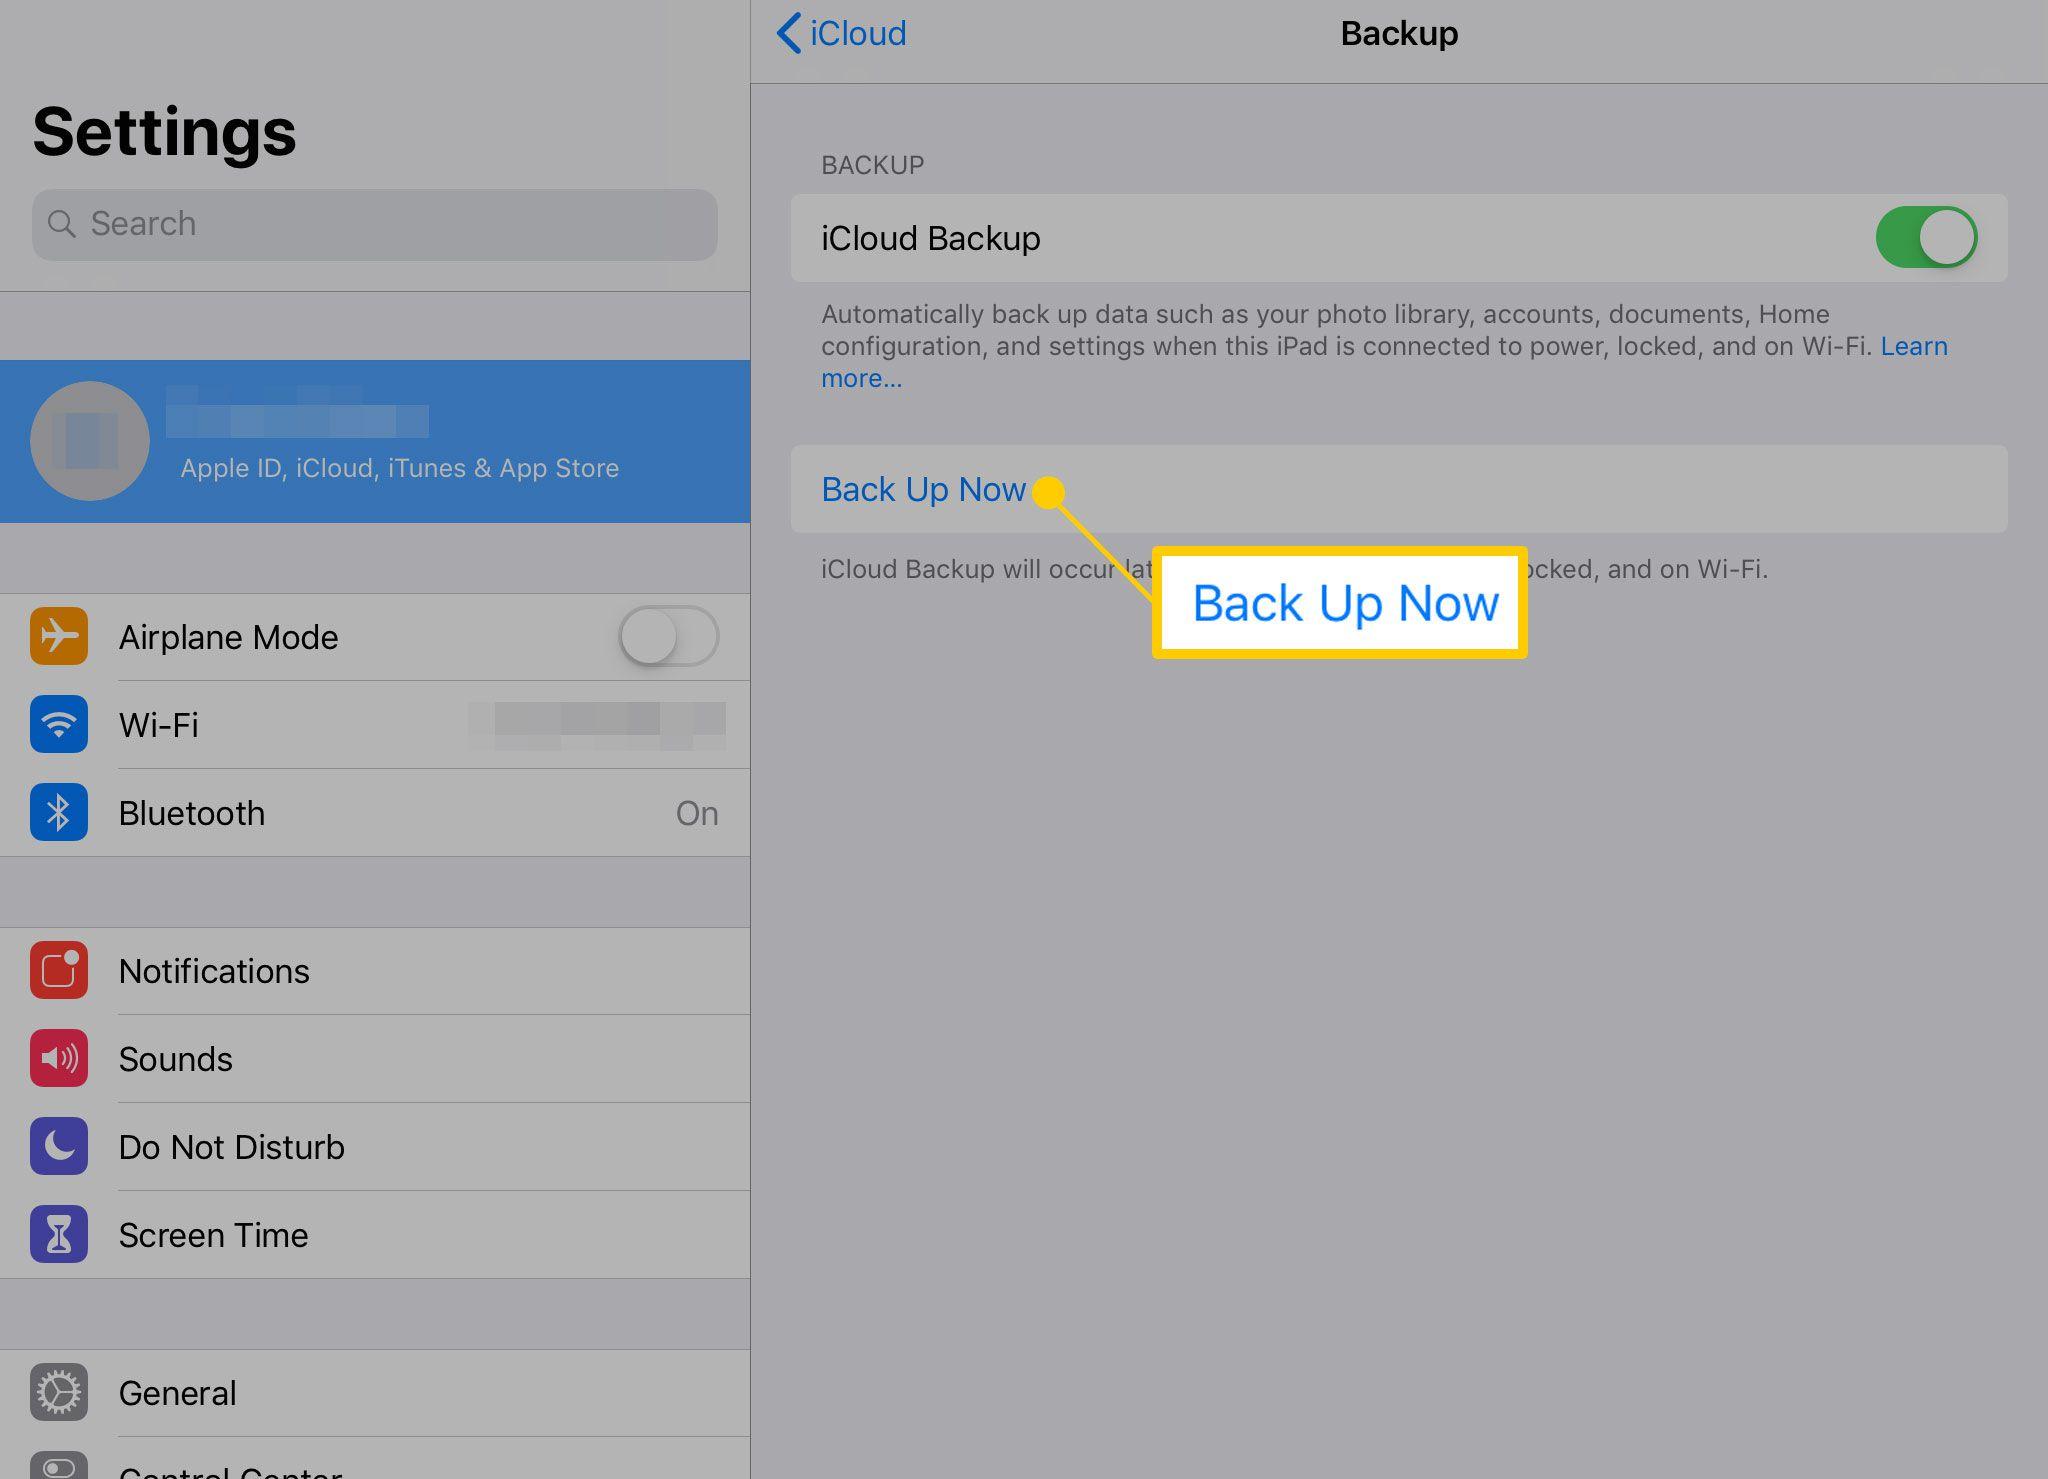 Manual backup on iPad